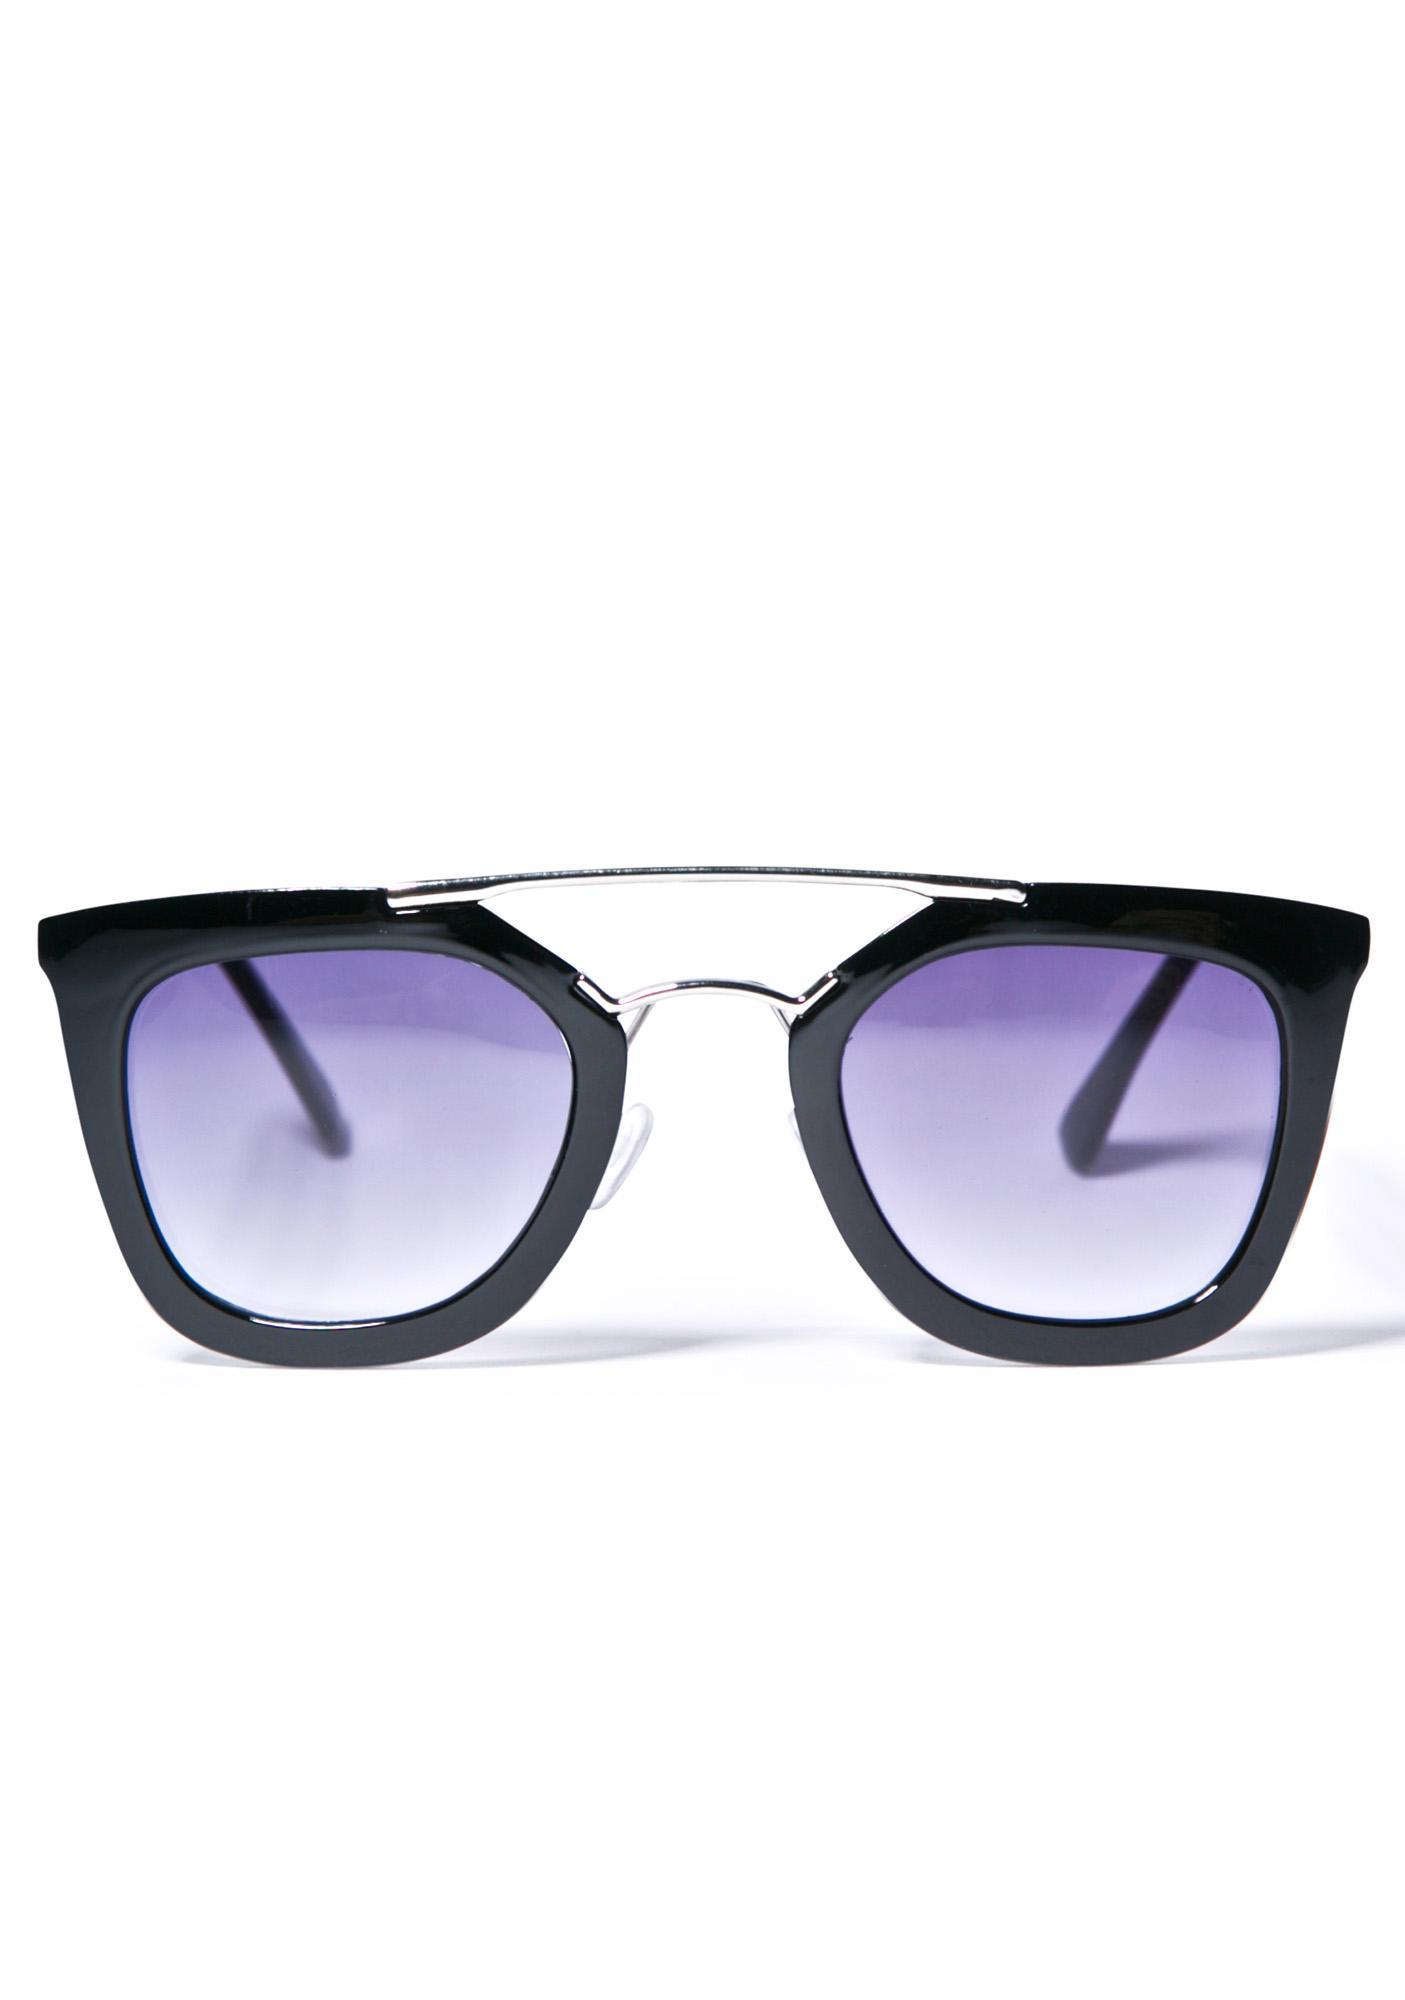 Sovite Sunglasses